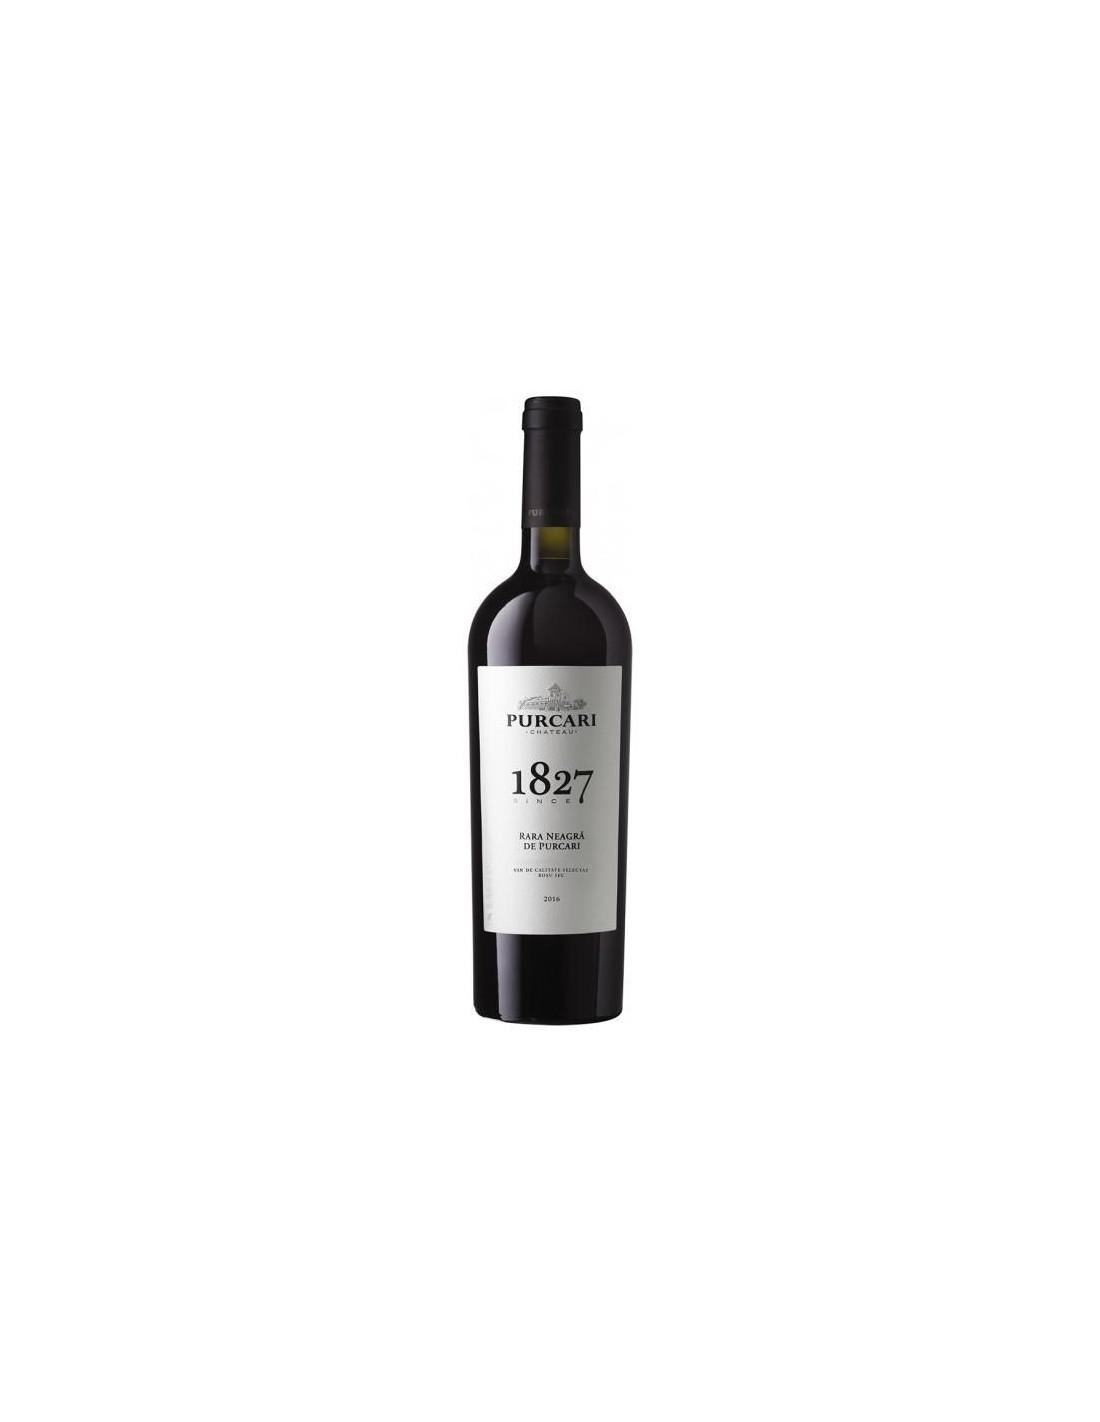 Vin rosu sec, Rara Neagra, Purcari Stefan Voda, 0.75L, 12.5% alc., Republica Moldova